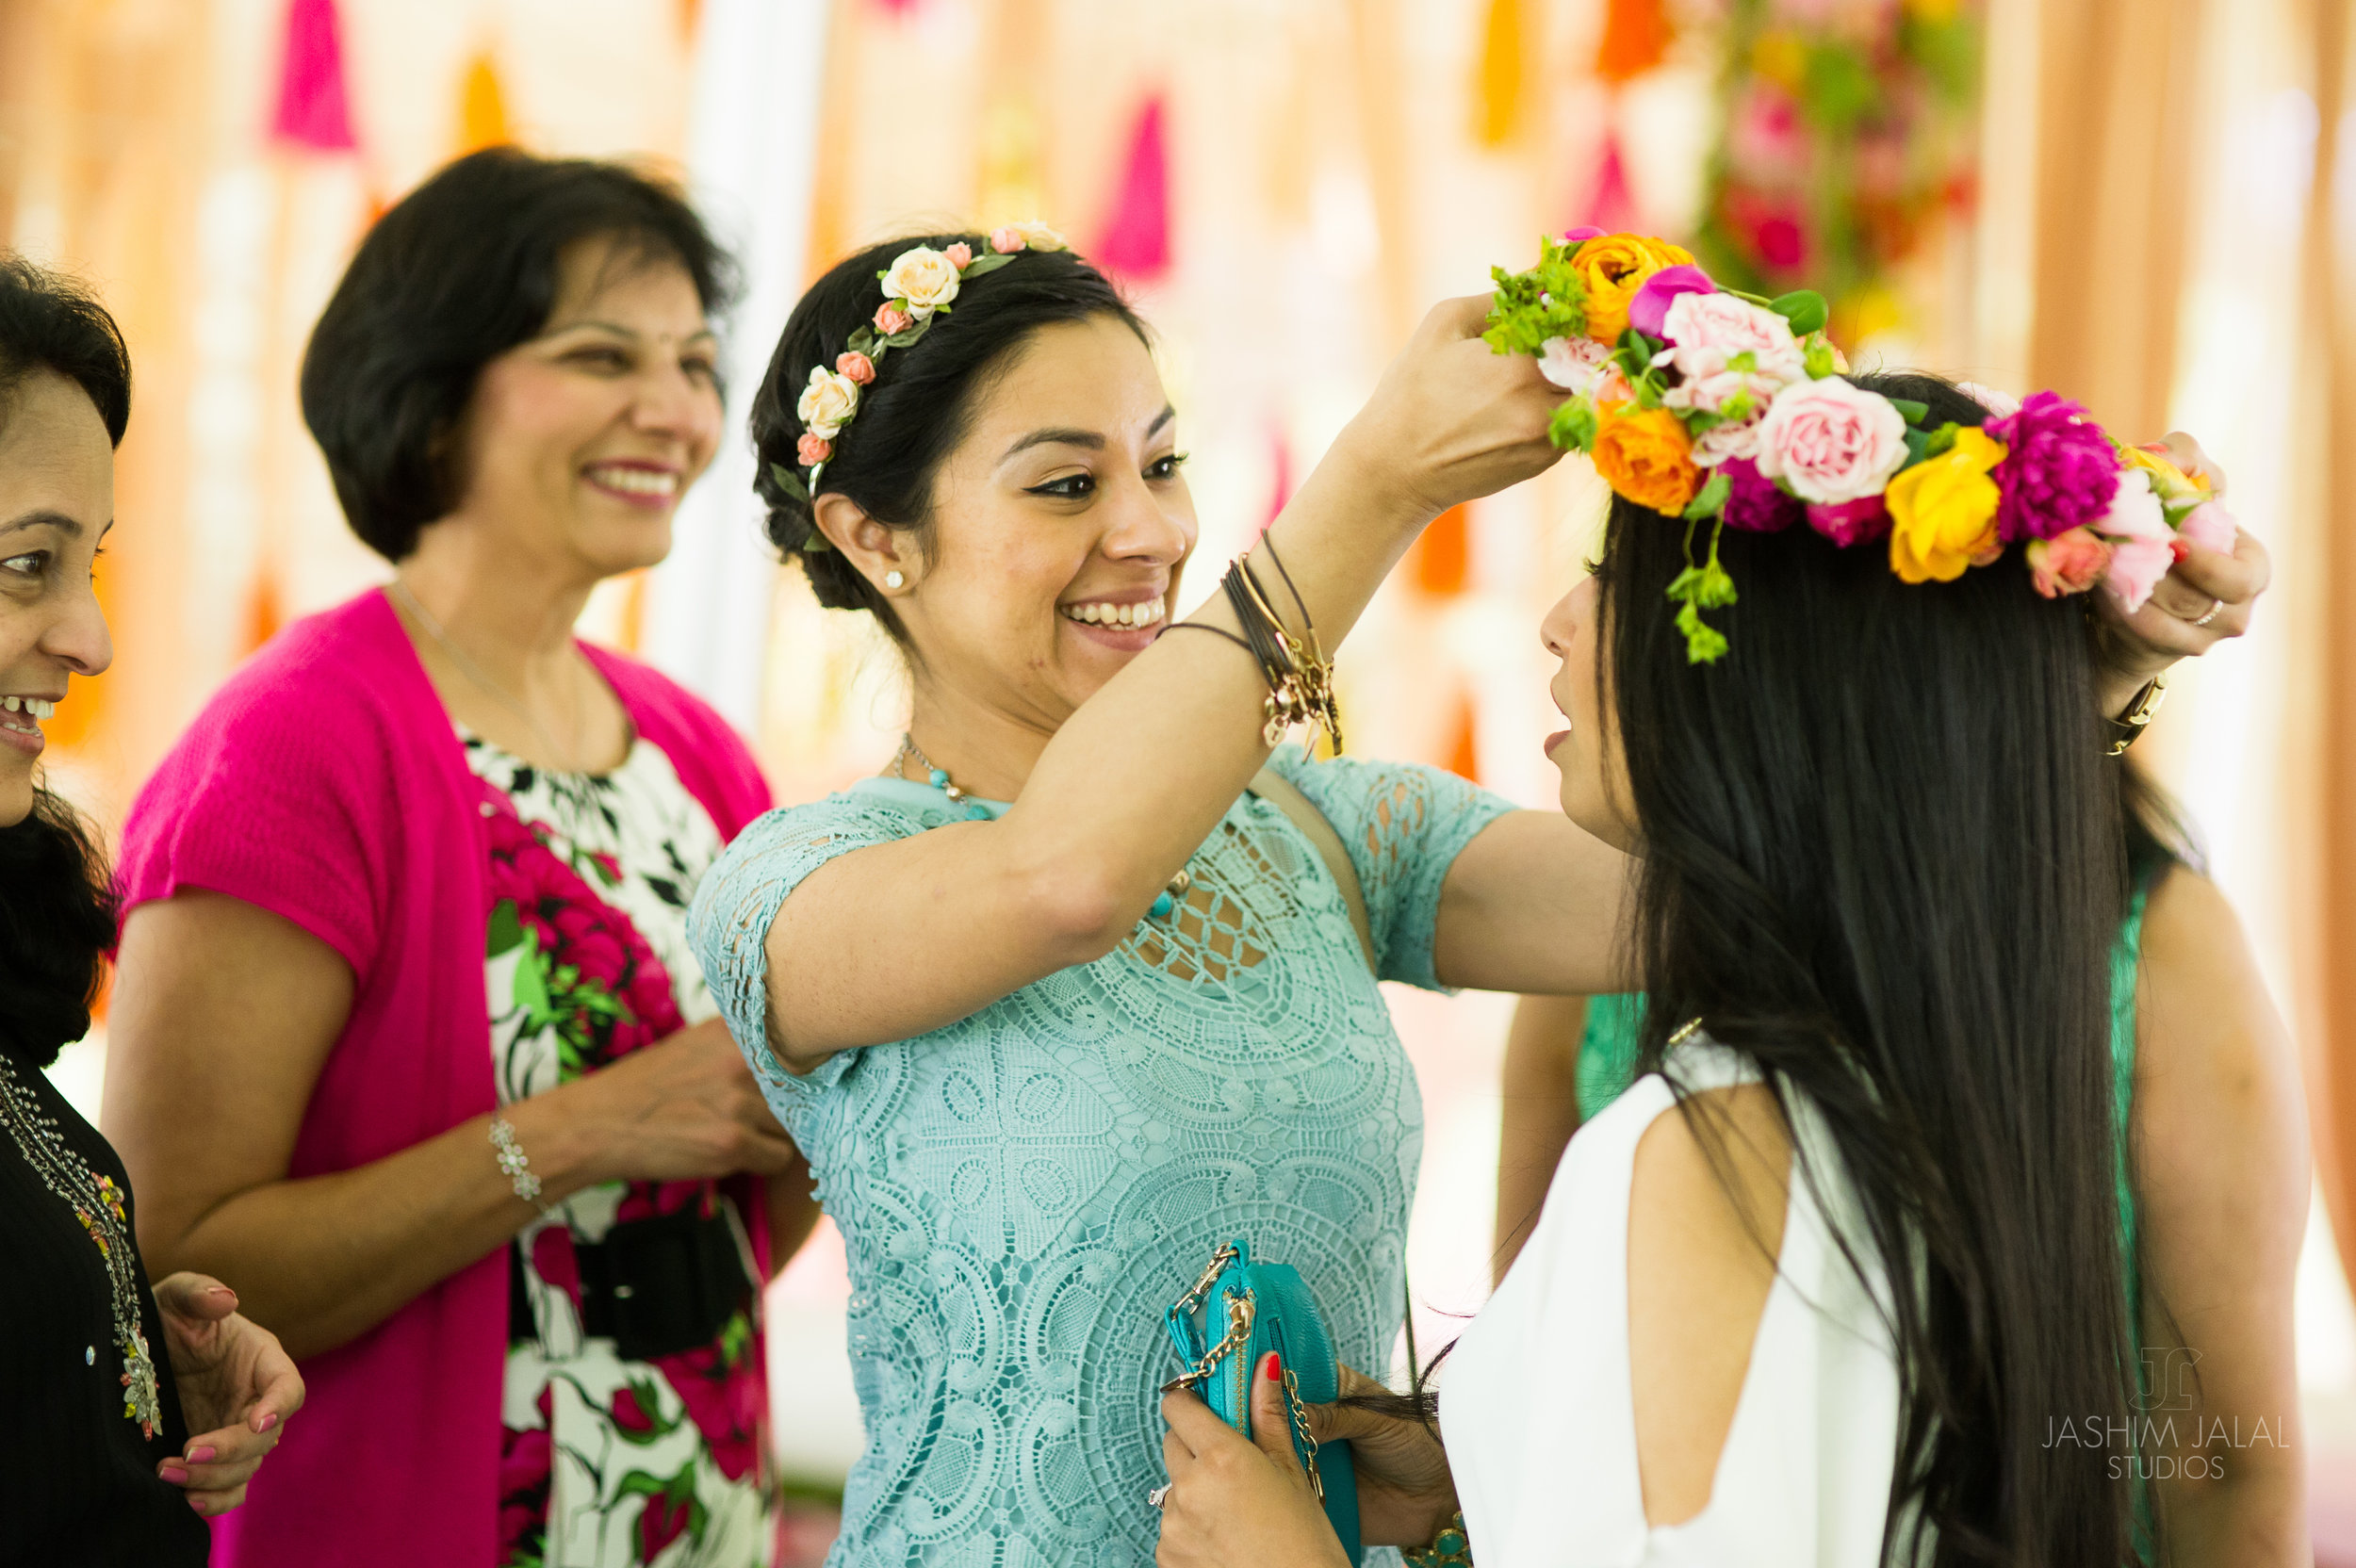 Indian Bridal Shower Boho Chic Summer Tent Event with Dancer (1).JPG